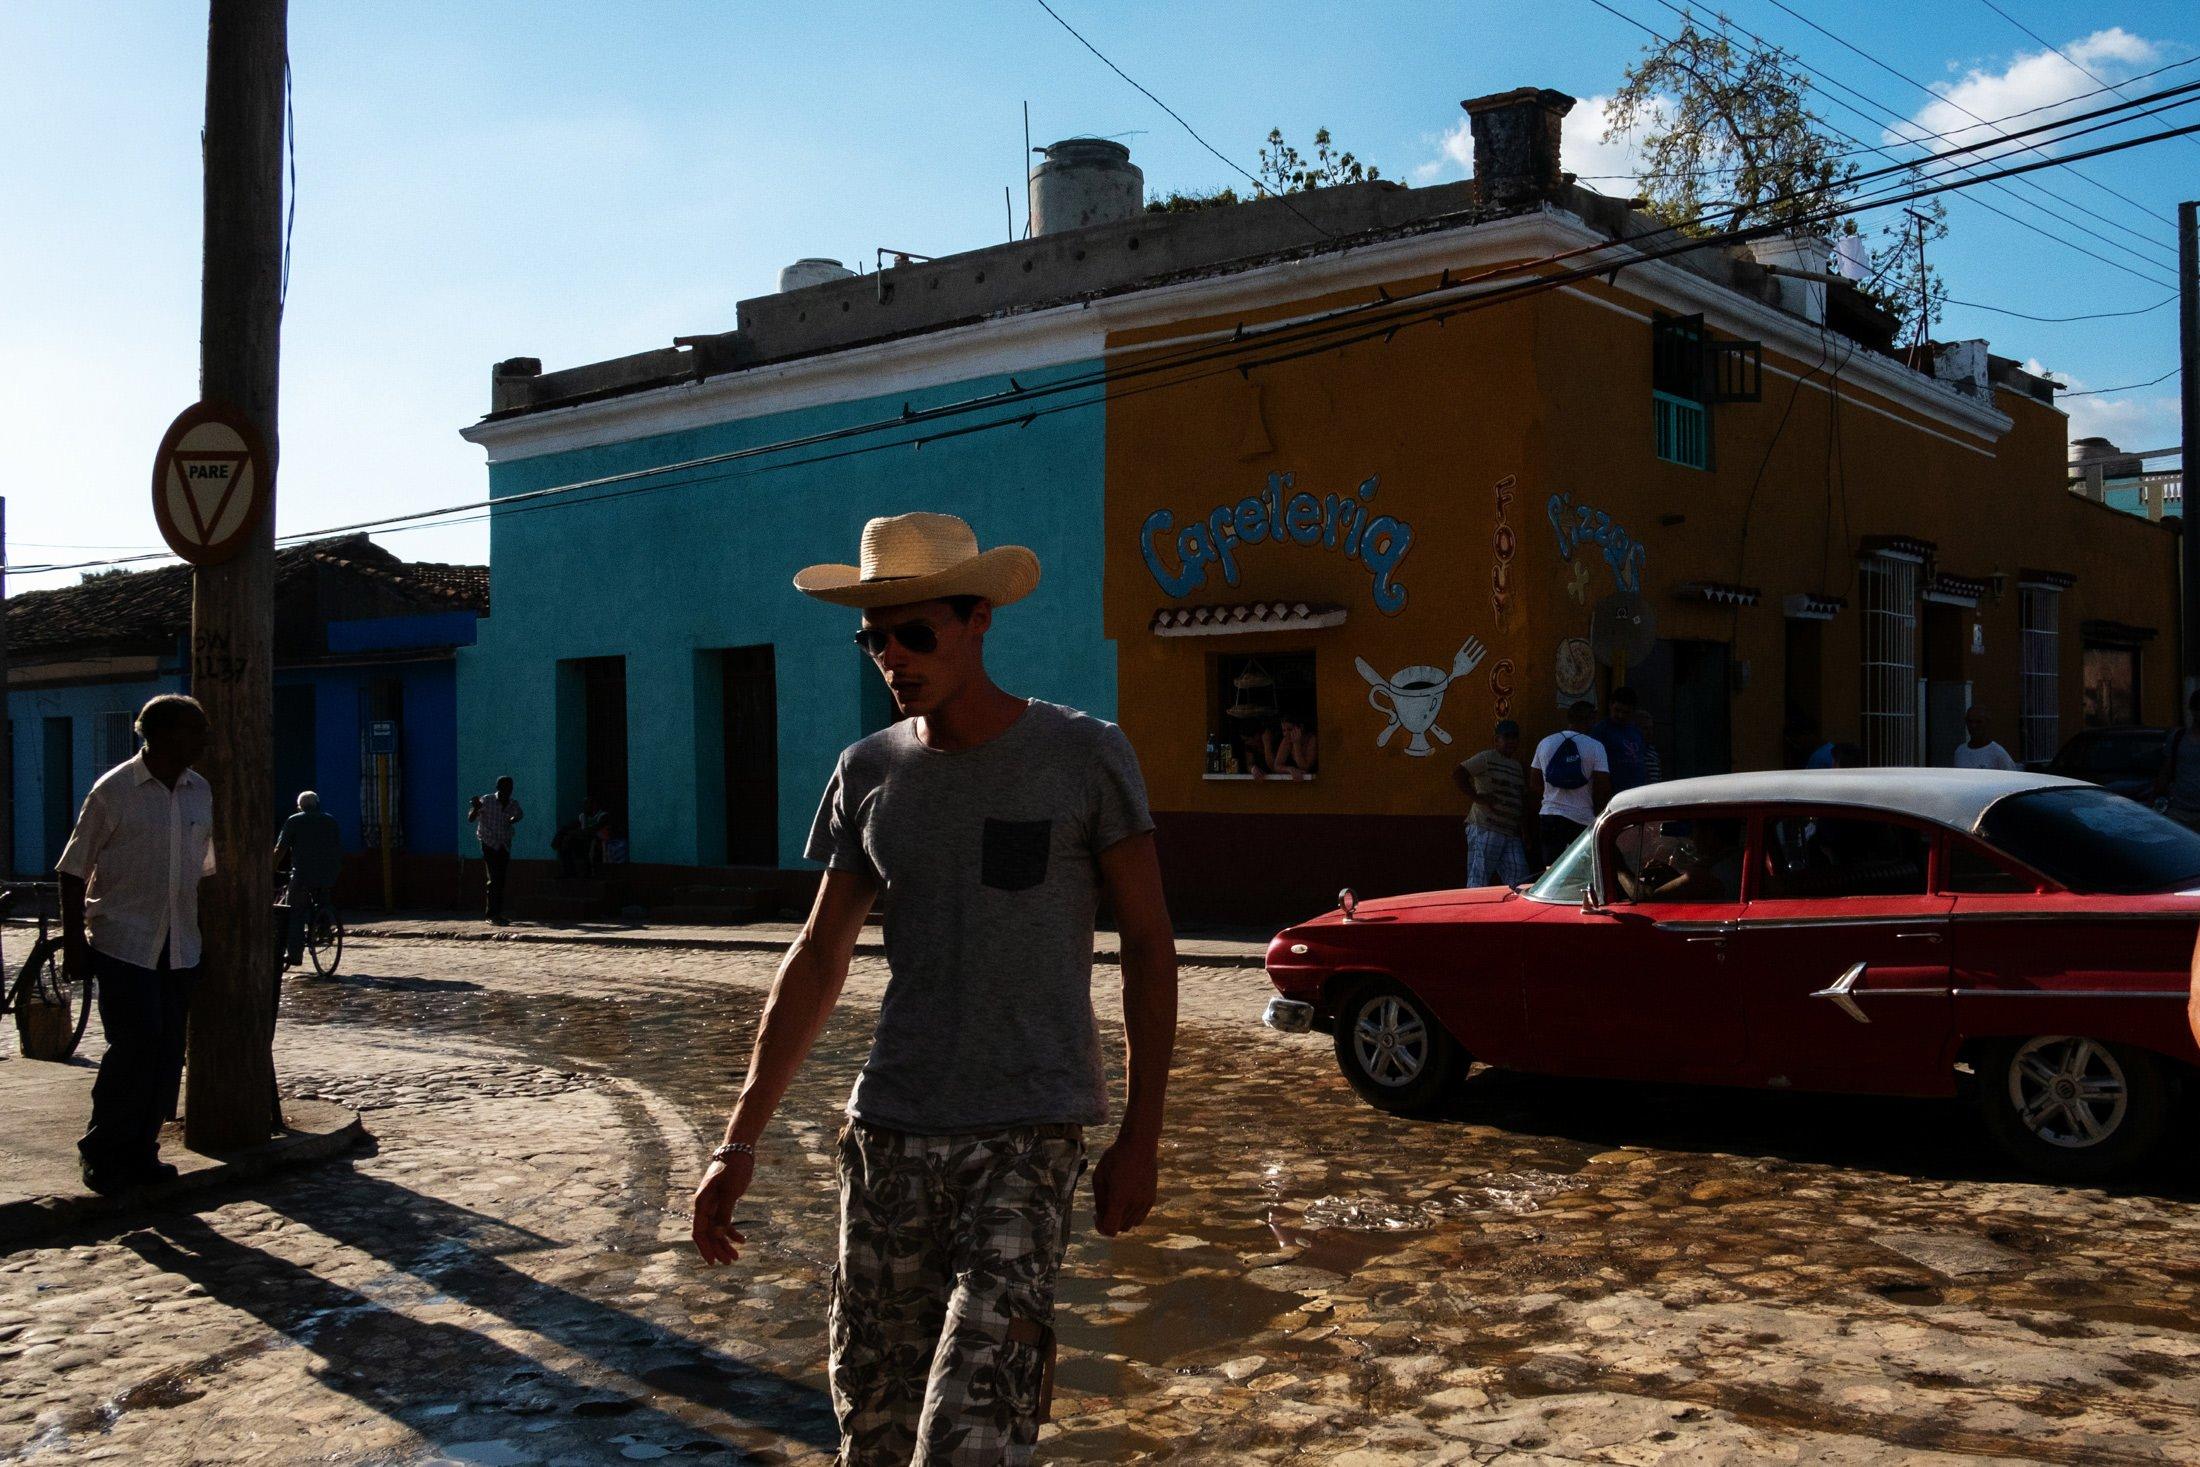 cowboy walking on the pavement in Trinidad, Cuba